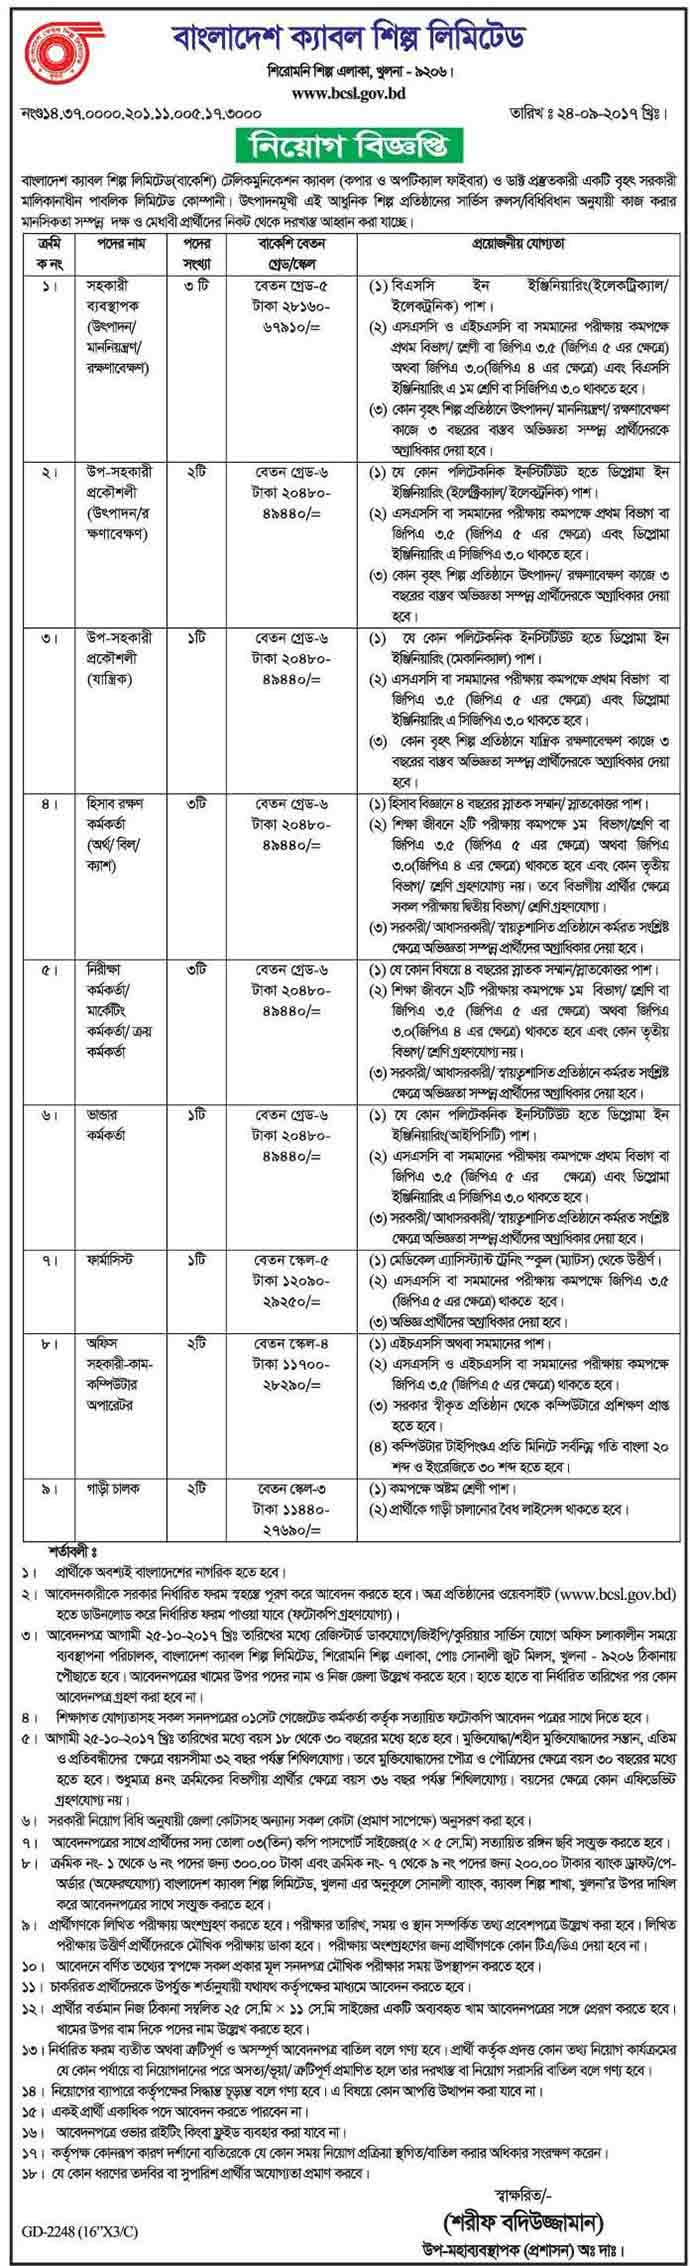 Bangladesh-Cable-Shilpa-Limited-Job-Circular-2017